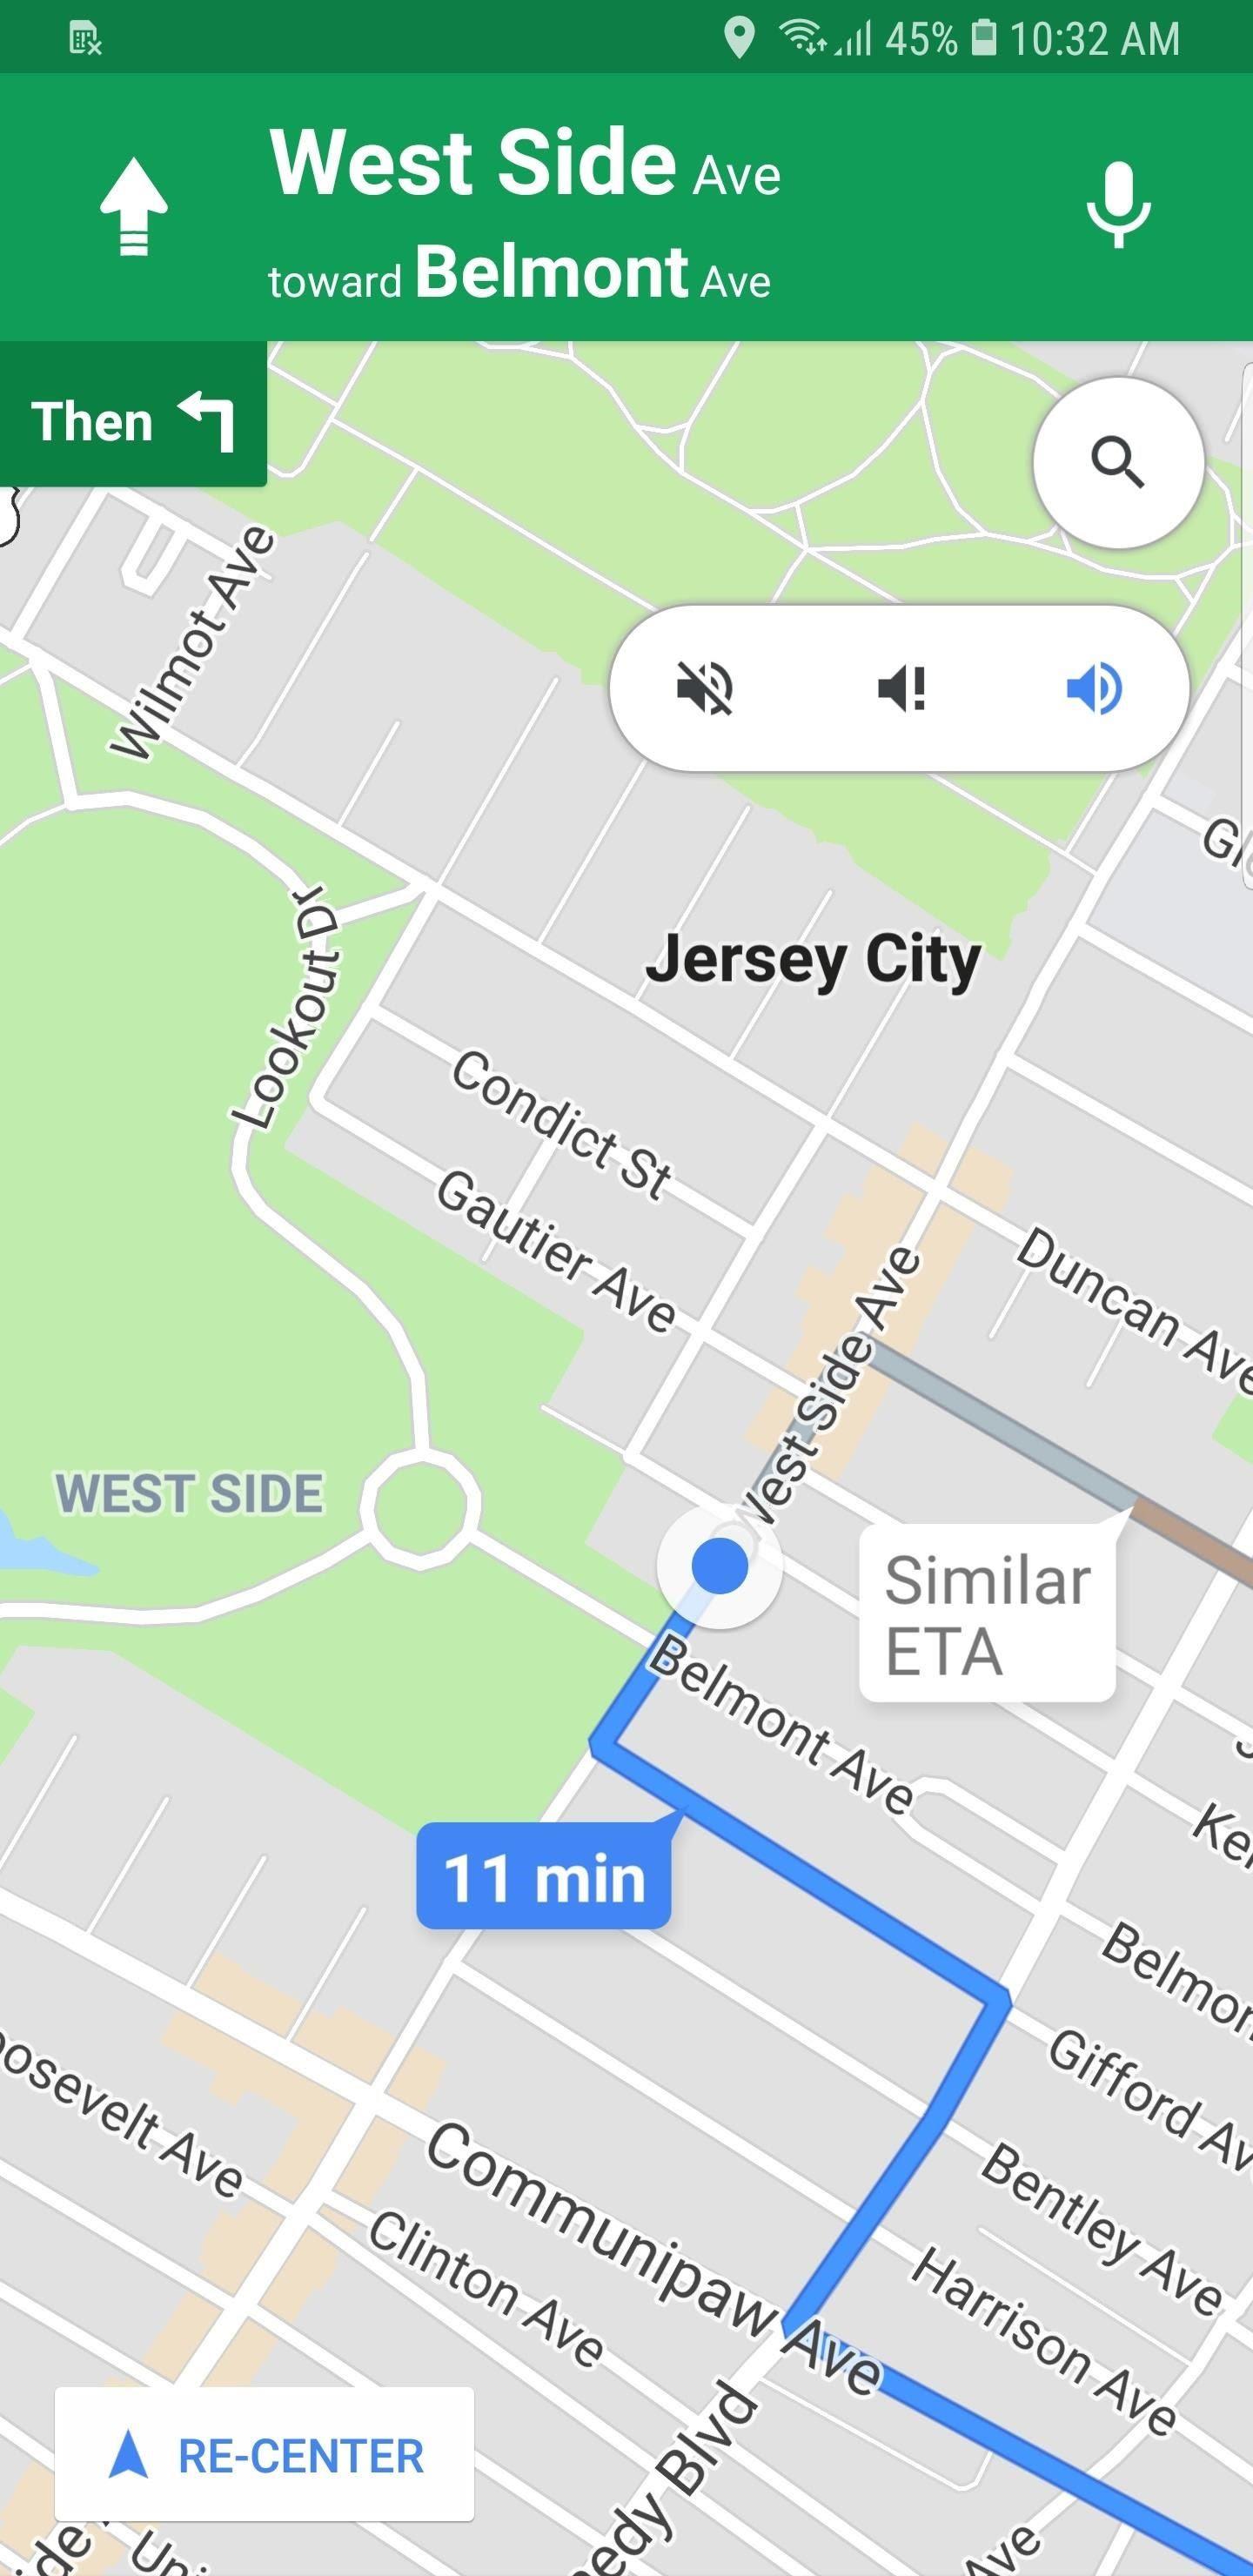 Google Maps 101 How To Tweak Voice Navigation Prompts On